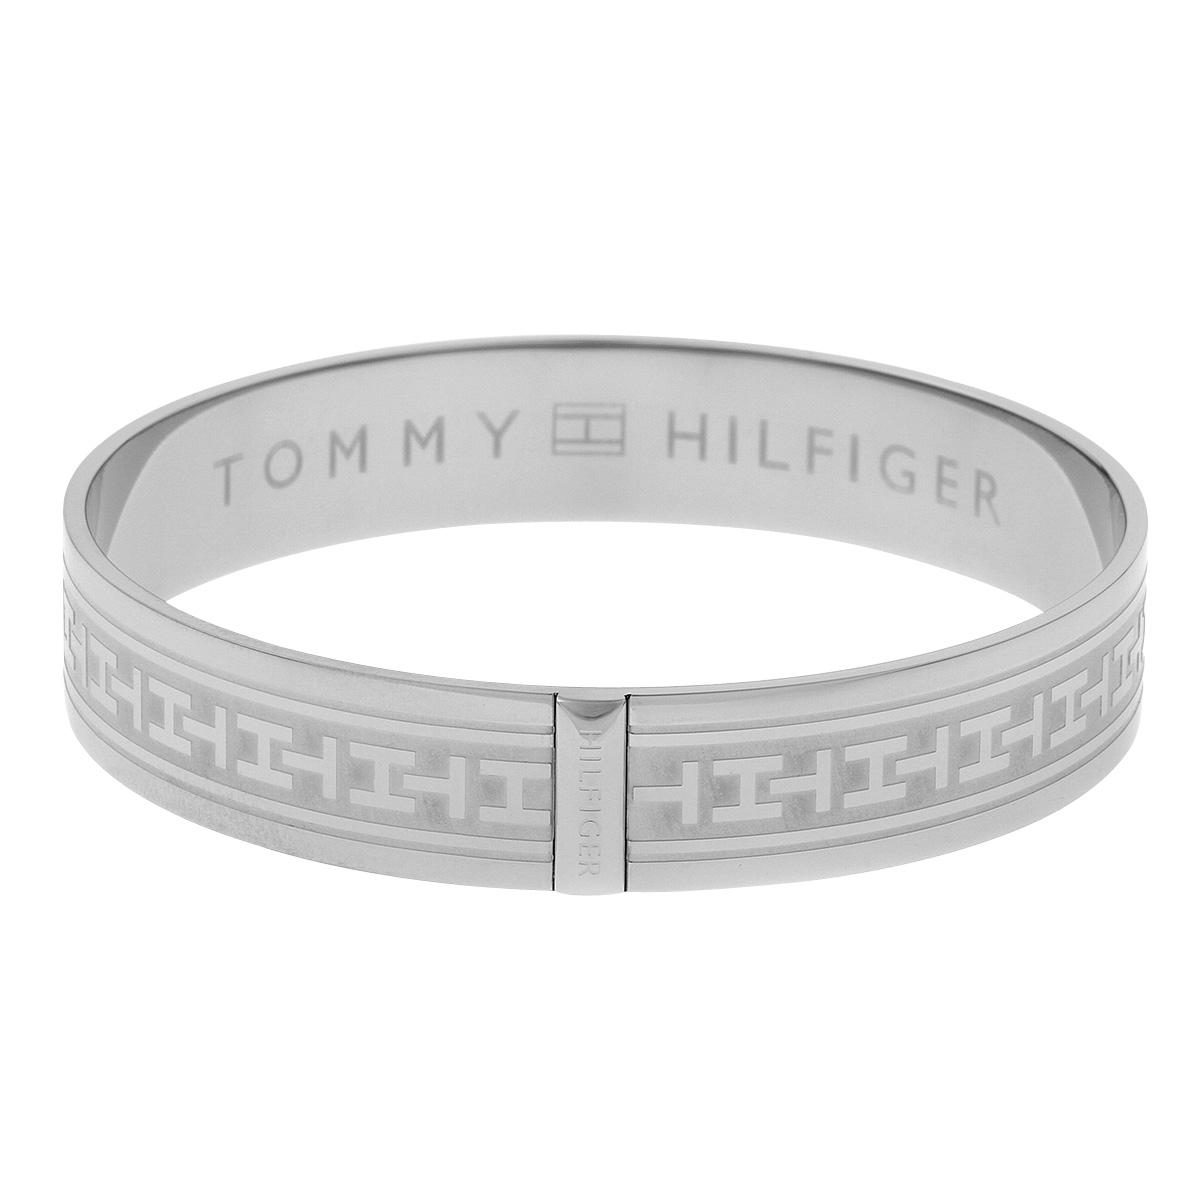 tommy hilfiger polished jewellery bracelet 2700019 ladies authentic accessory ebay. Black Bedroom Furniture Sets. Home Design Ideas